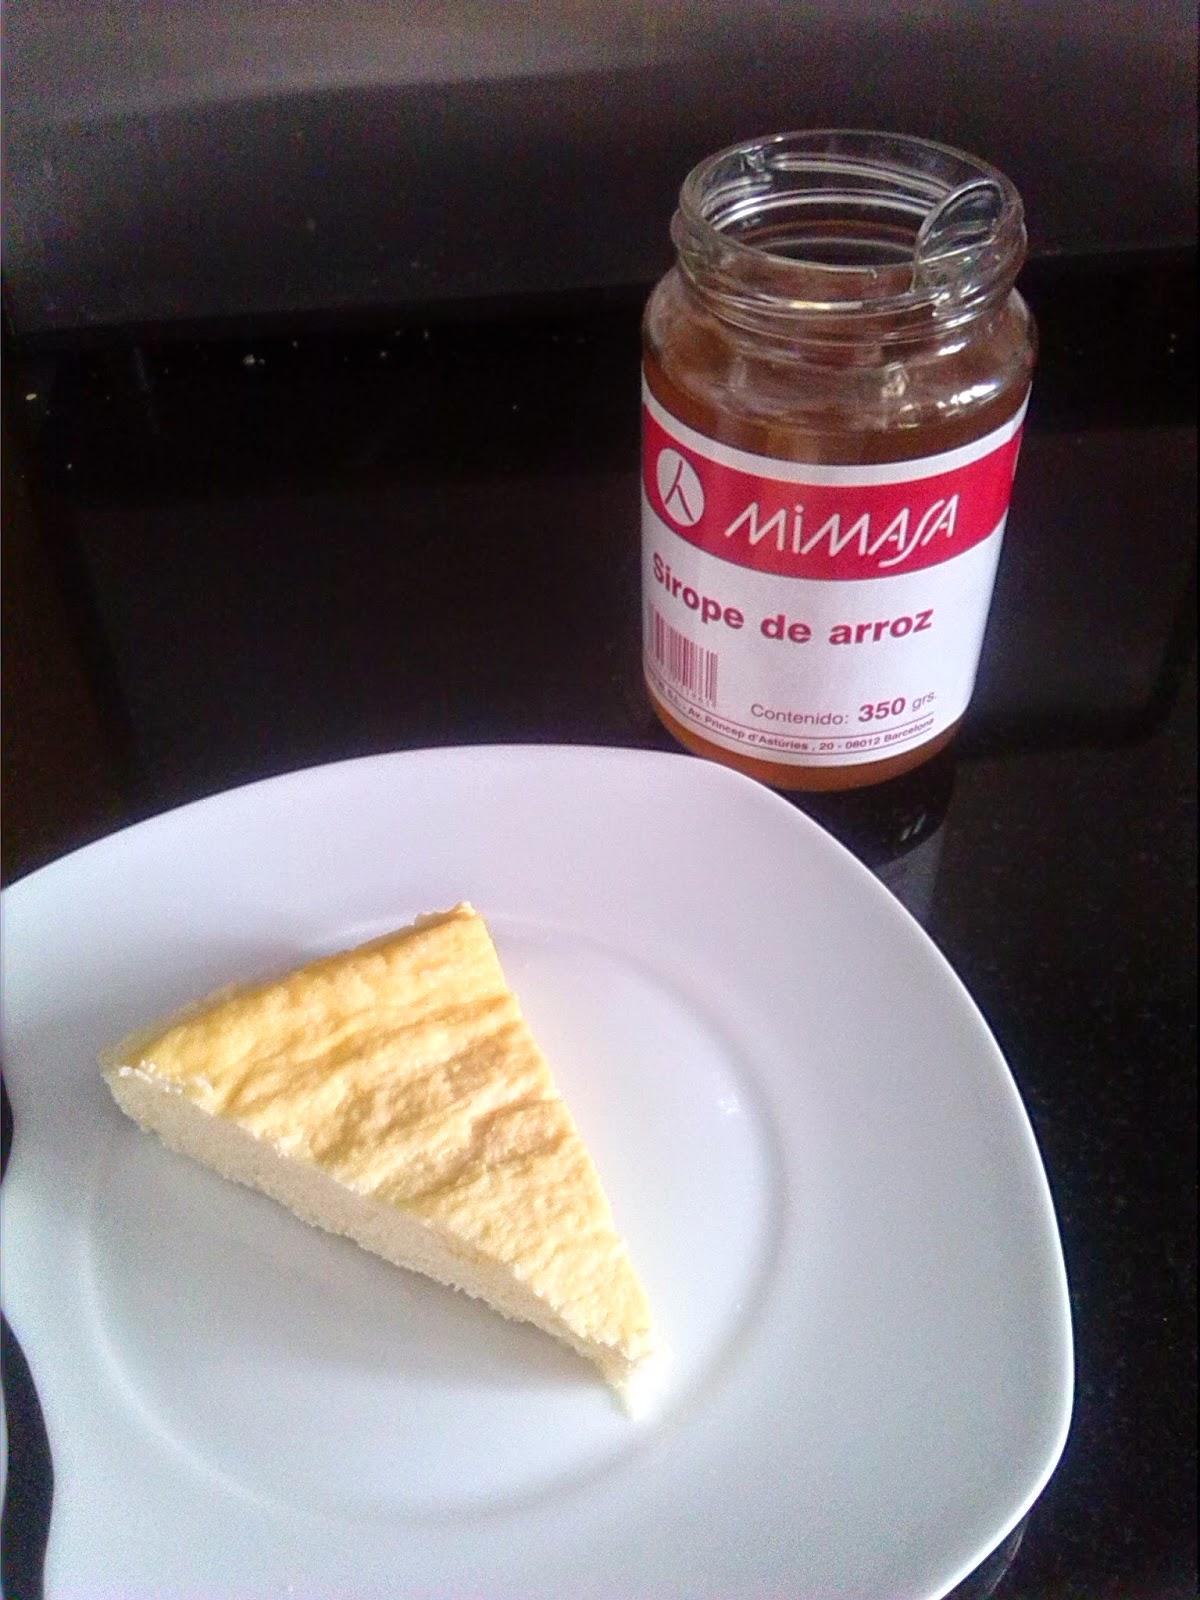 tarta de queso mimasa sirope de arroz